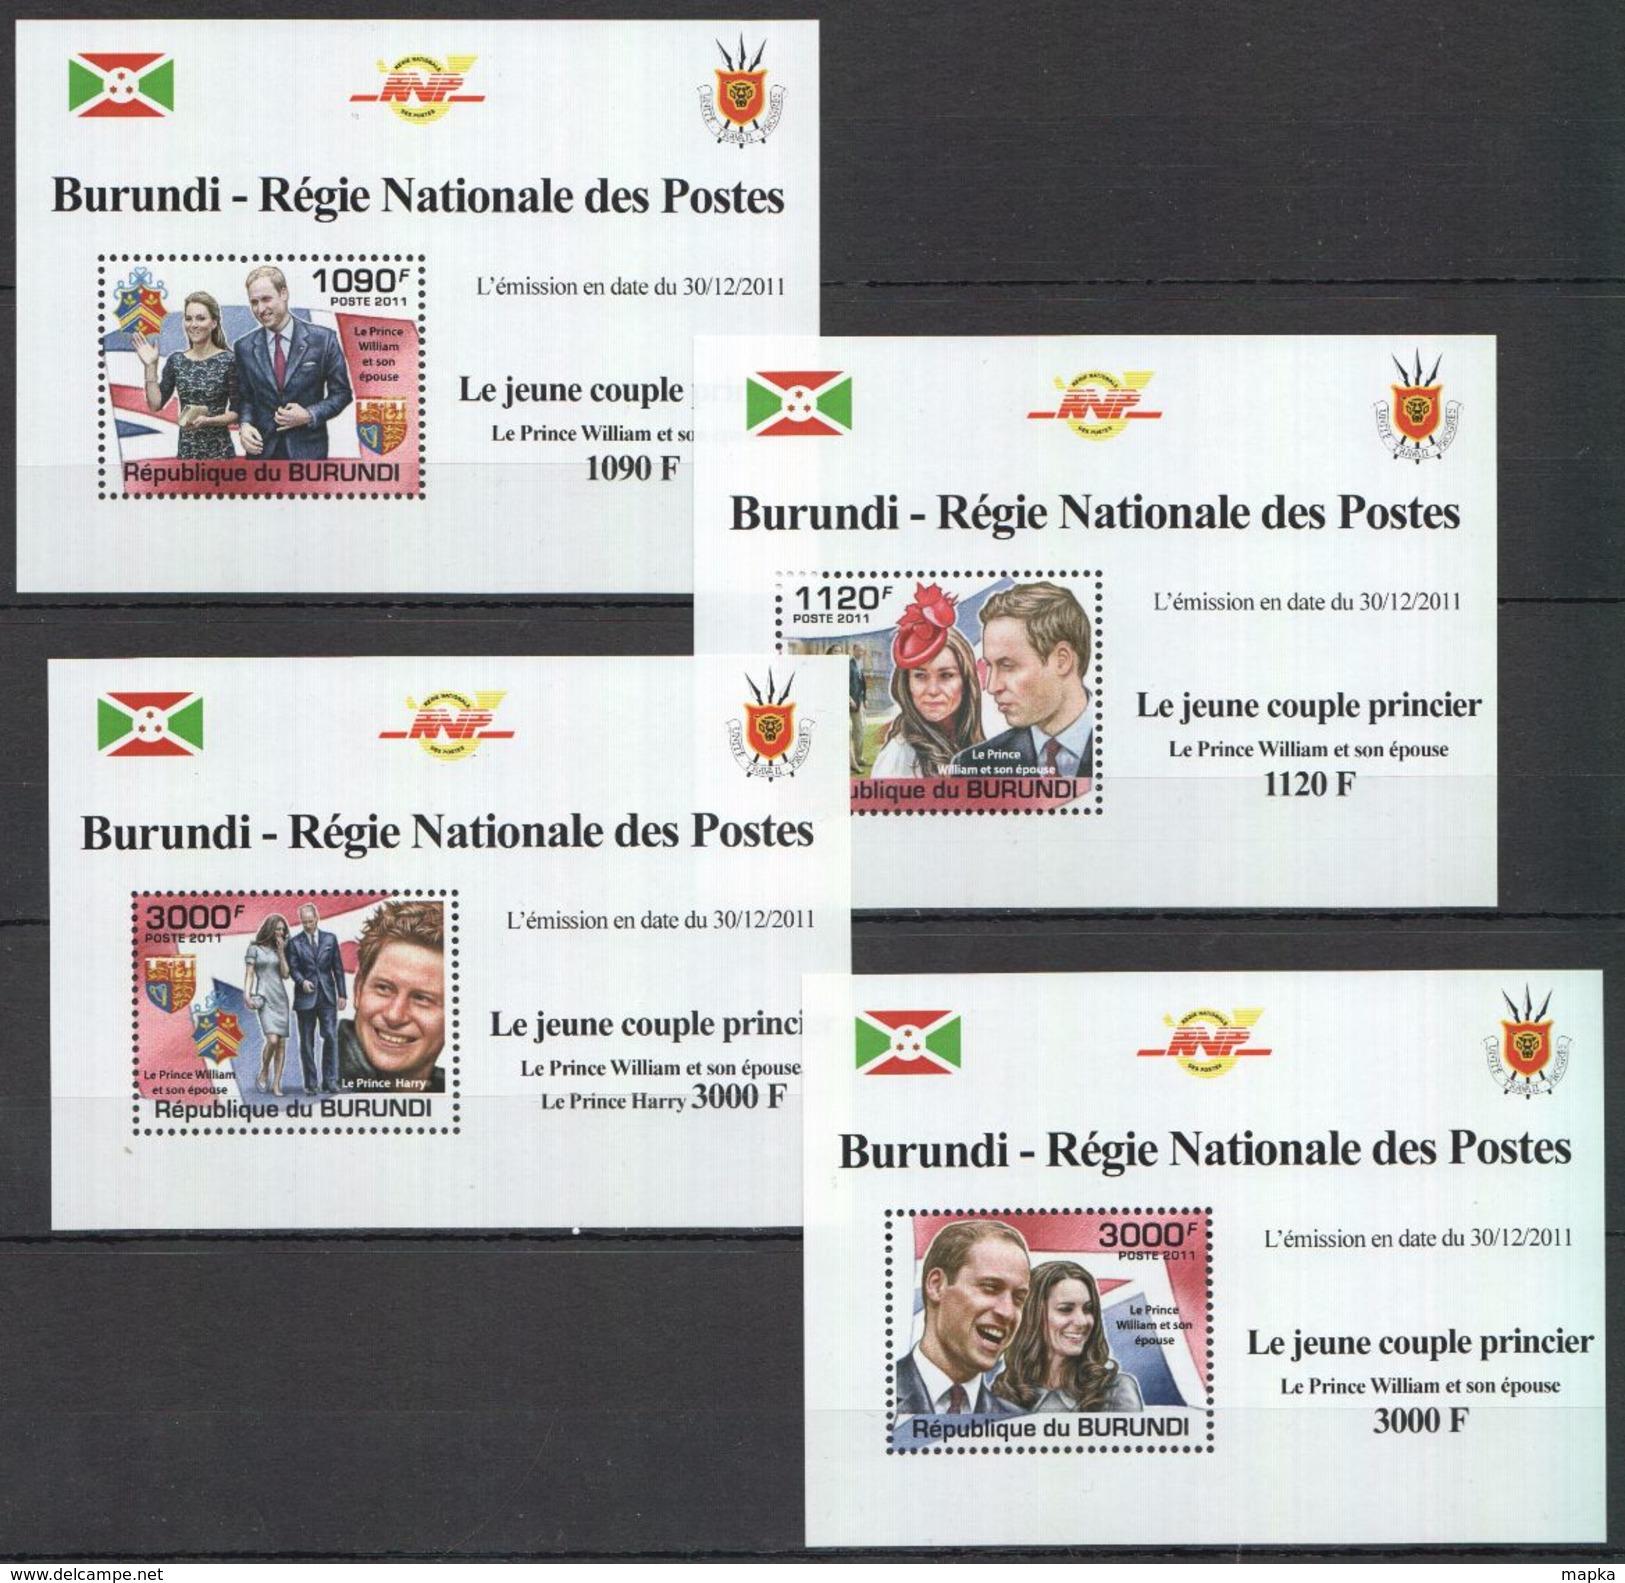 G763 2011 BURUNDI ROYALTY JEUNE COUPLE PRINCIER PRINCE WILLIAM !!! 4 LUX BL MNH - Familles Royales